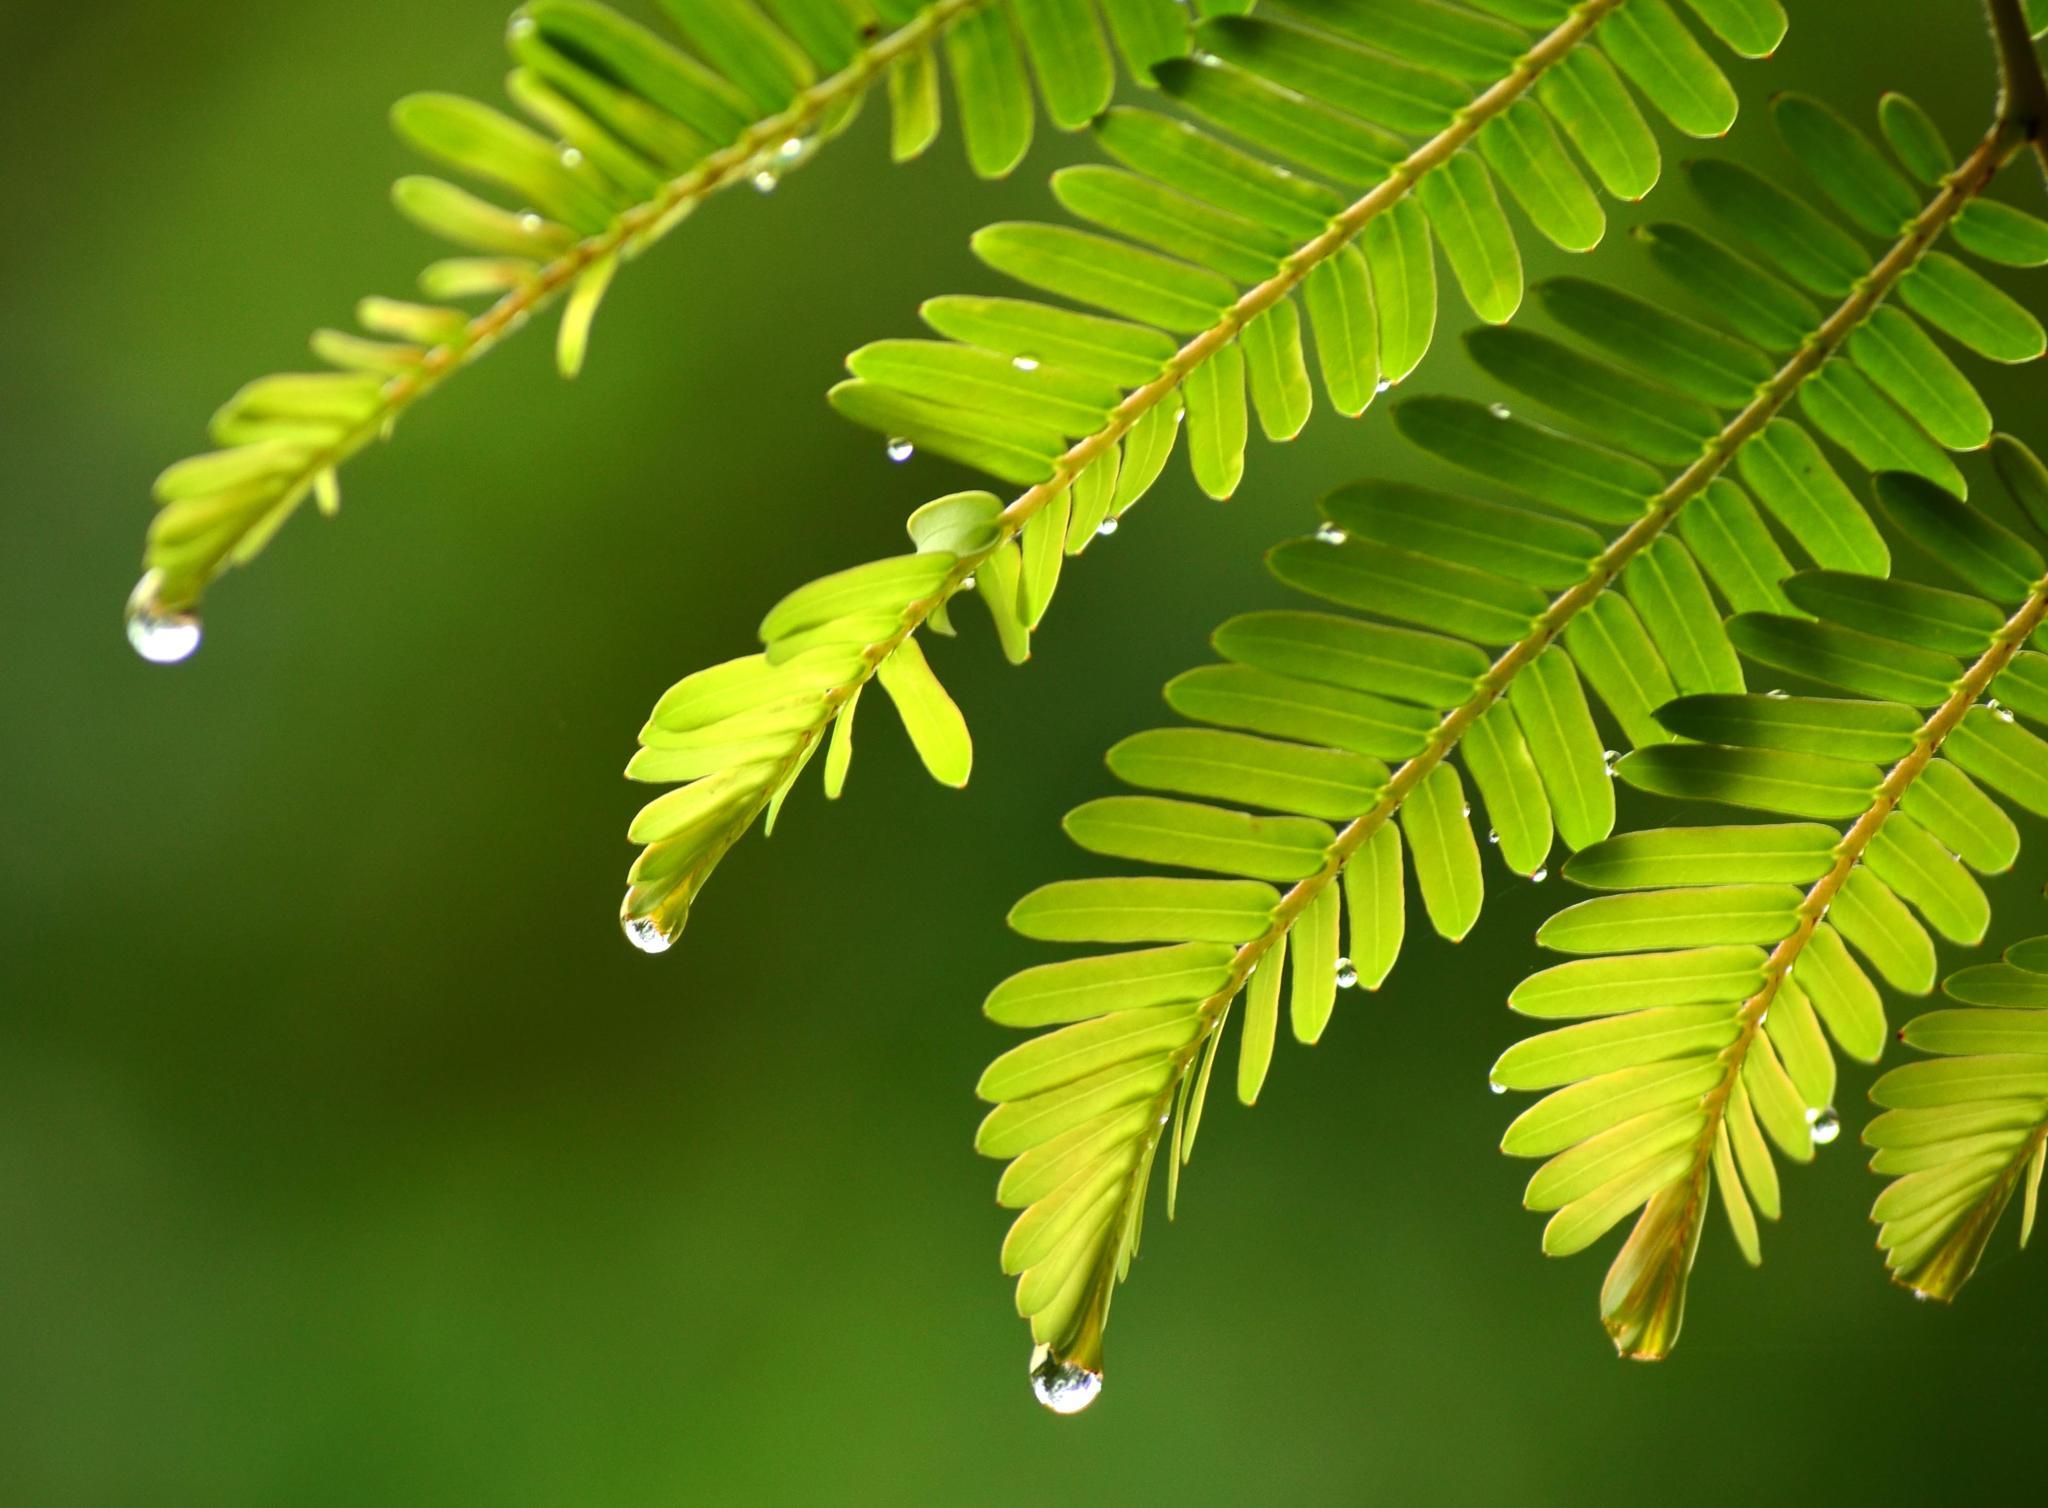 After the rain by Pradeep Krishnan